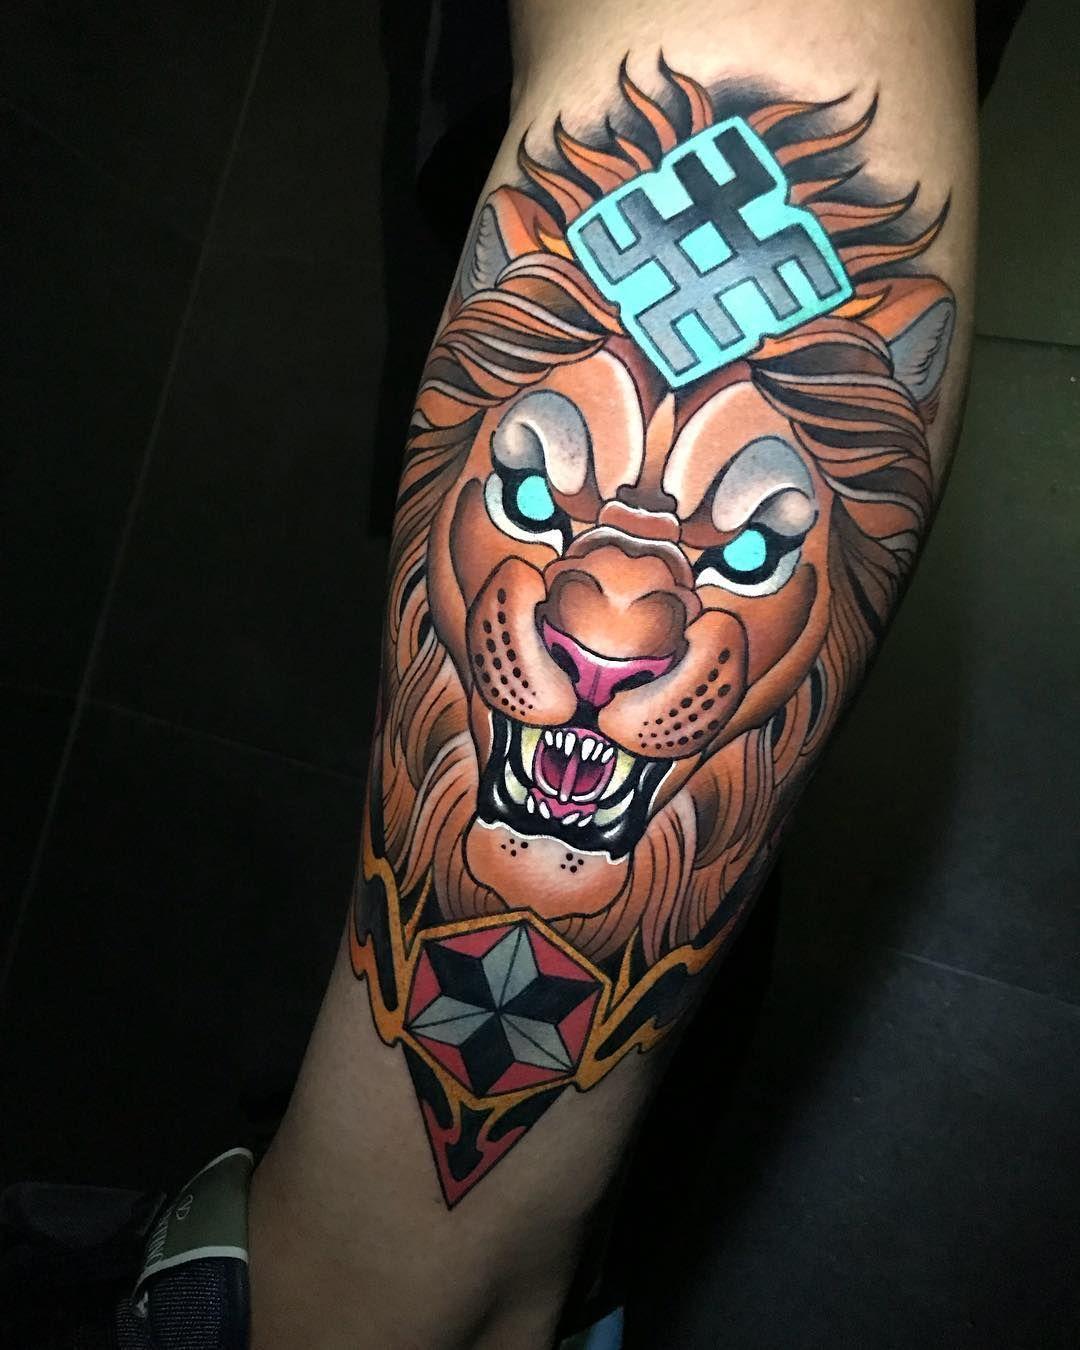 Tattoo artist Johnny Domus Mesquita colorfull neo